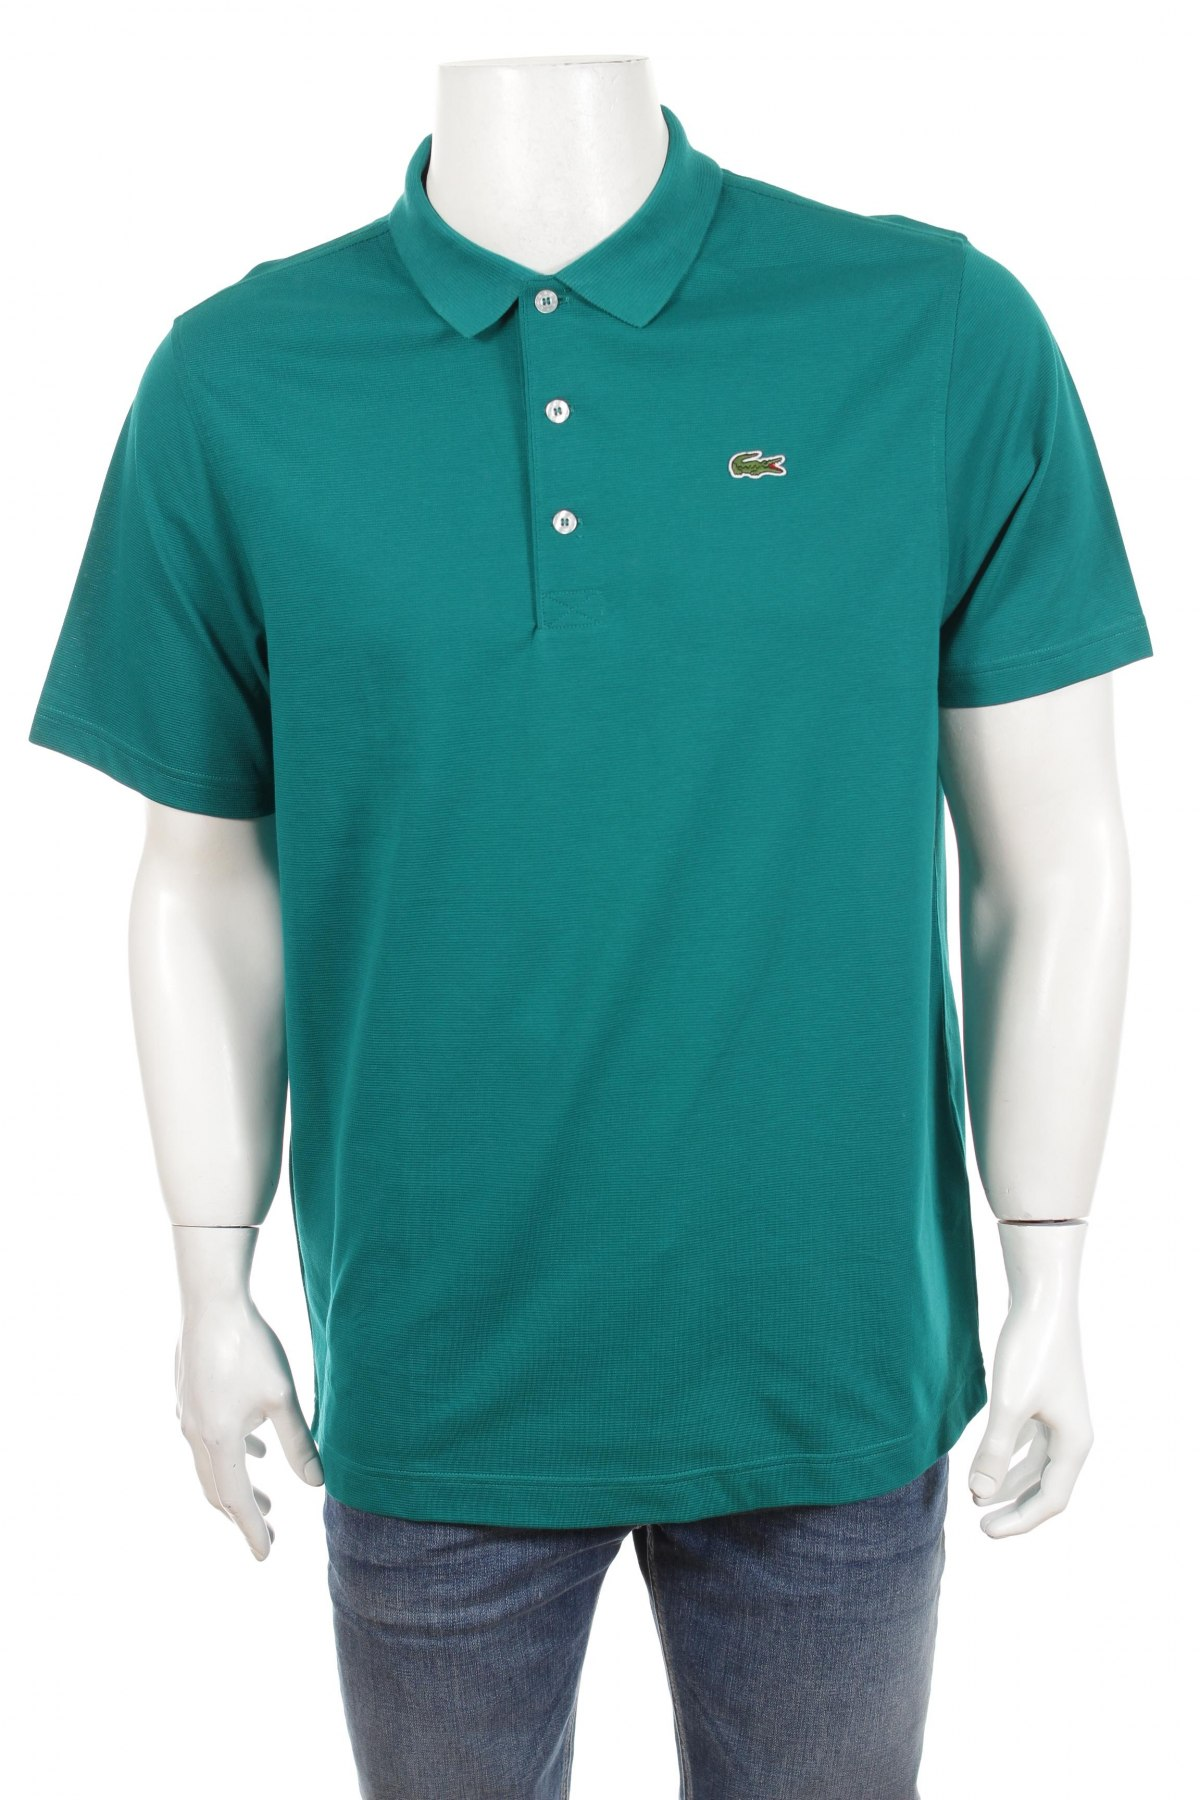 67df81174b05 Ανδρικό t-shirt Lacoste - σε συμφέρουσα τιμή στο Remix -  101803098